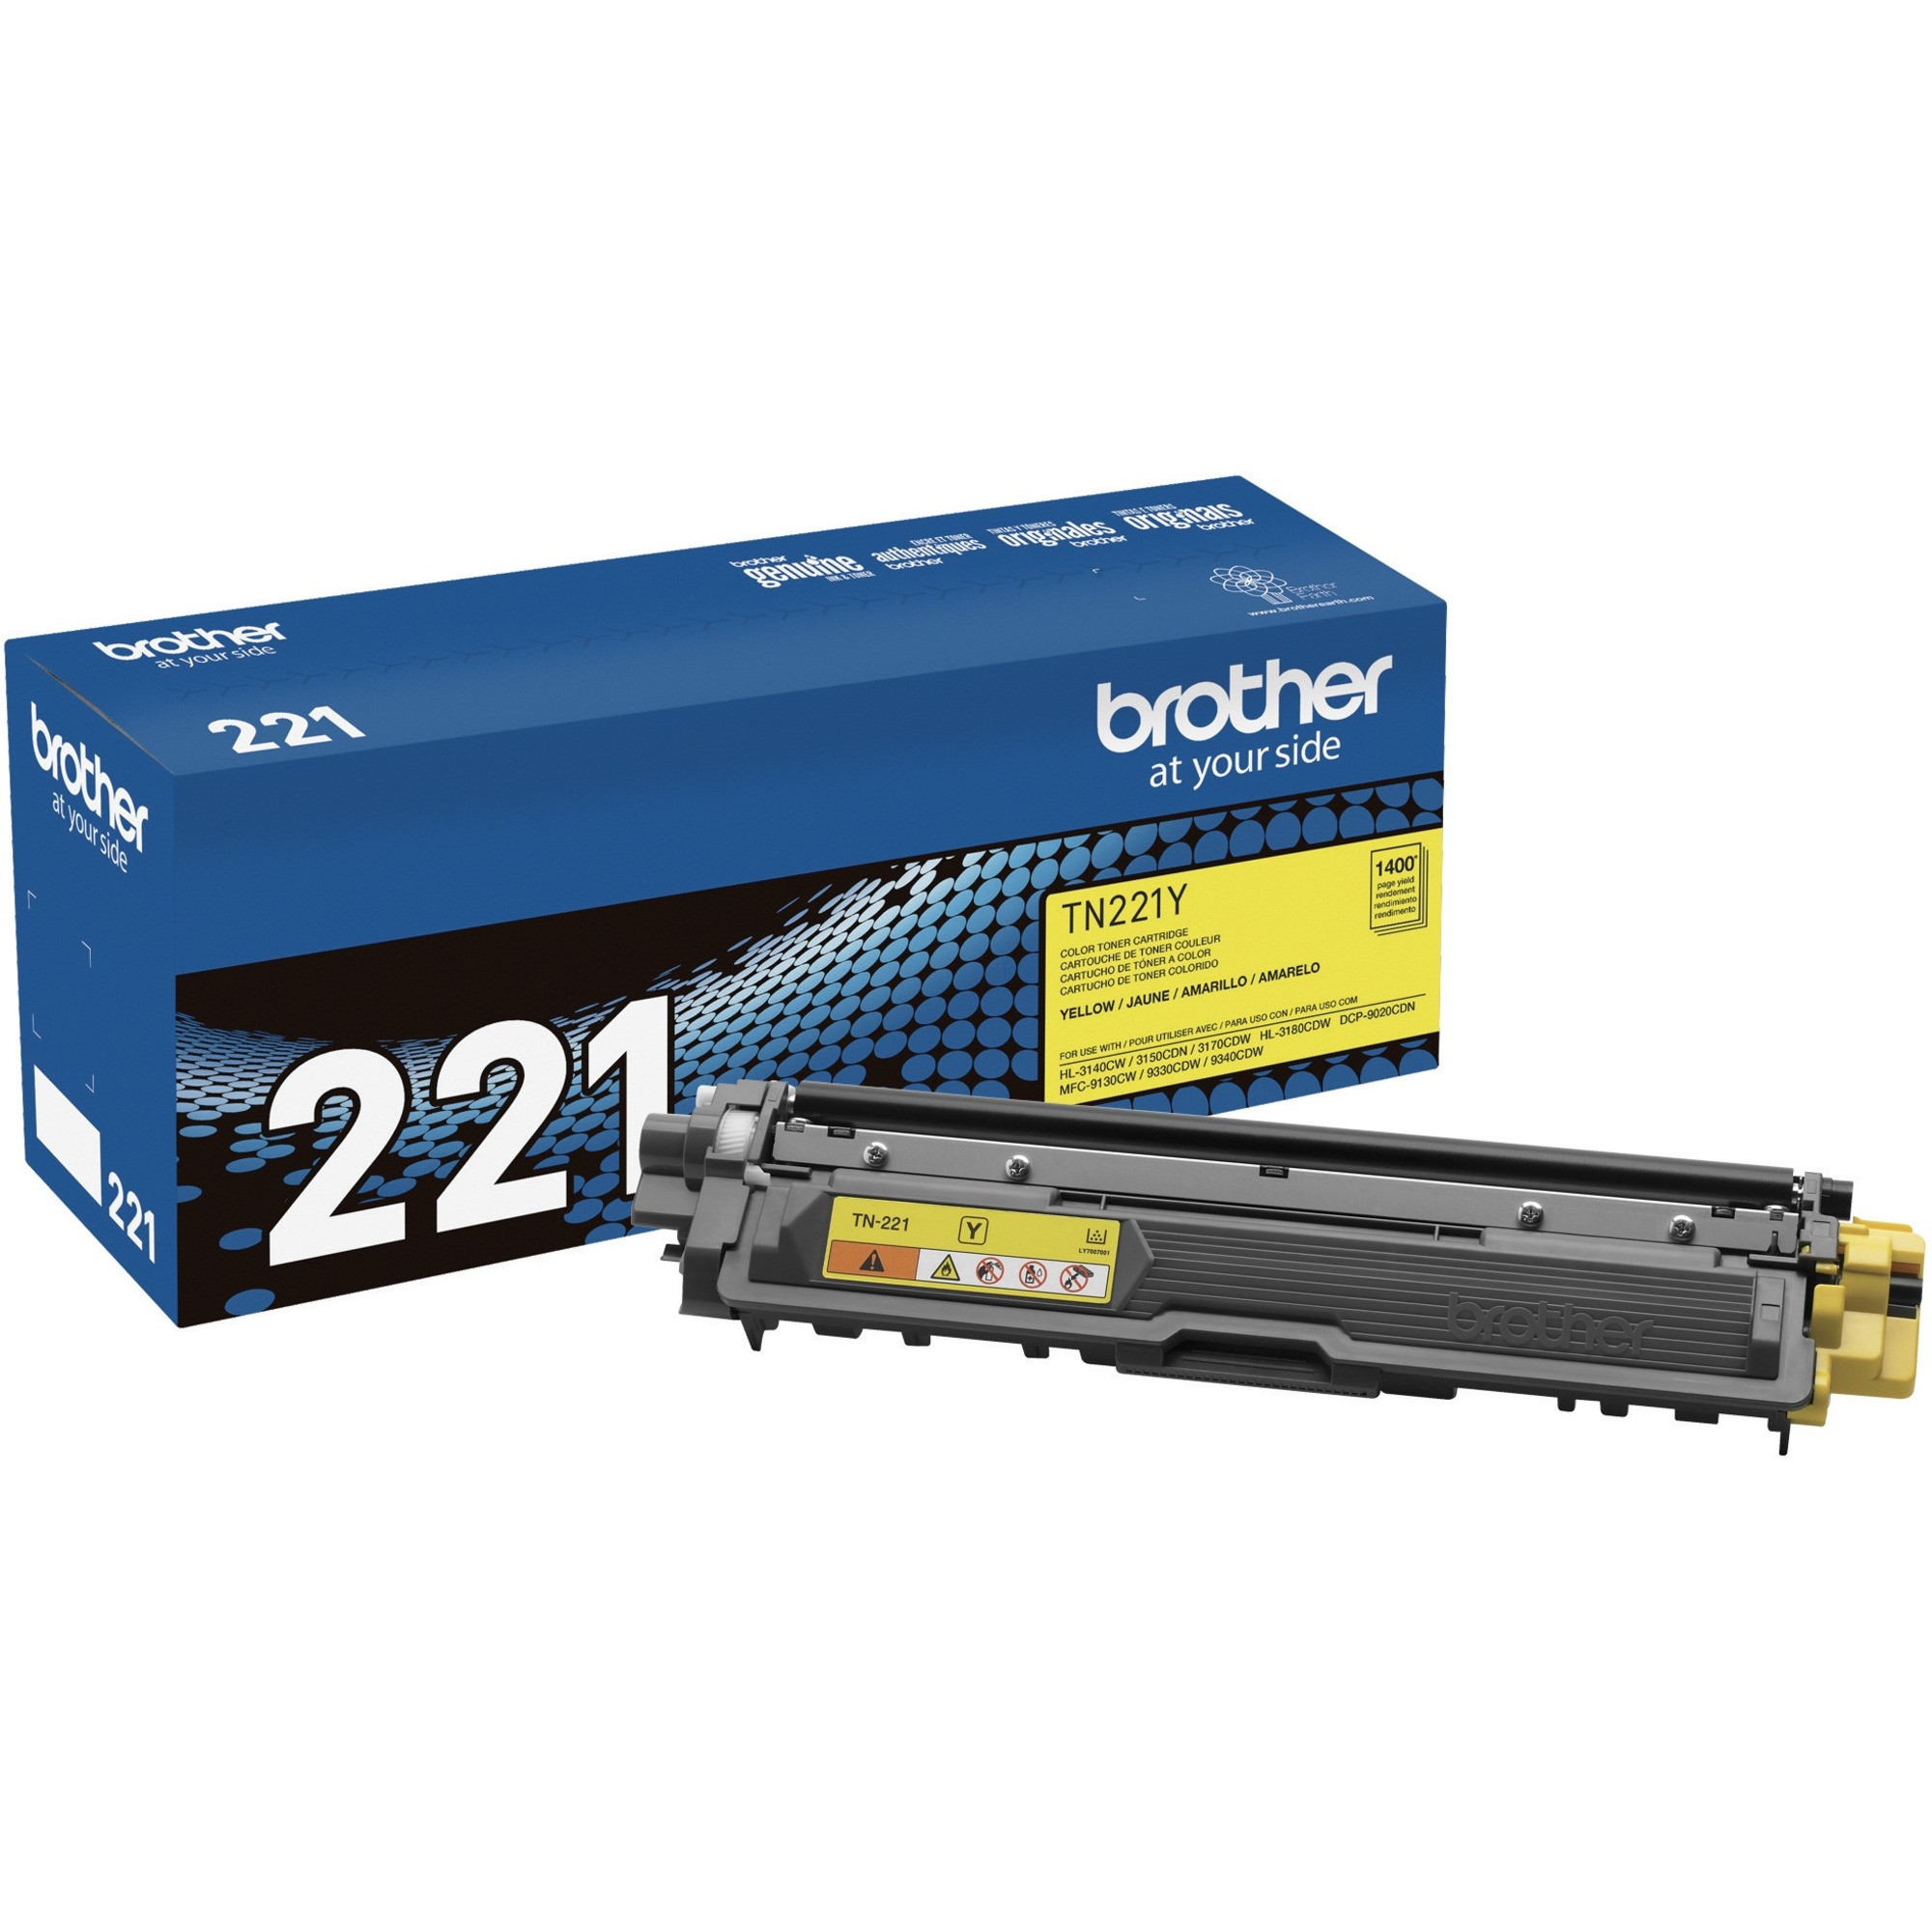 Brother TN221/225 Toner Cartridges